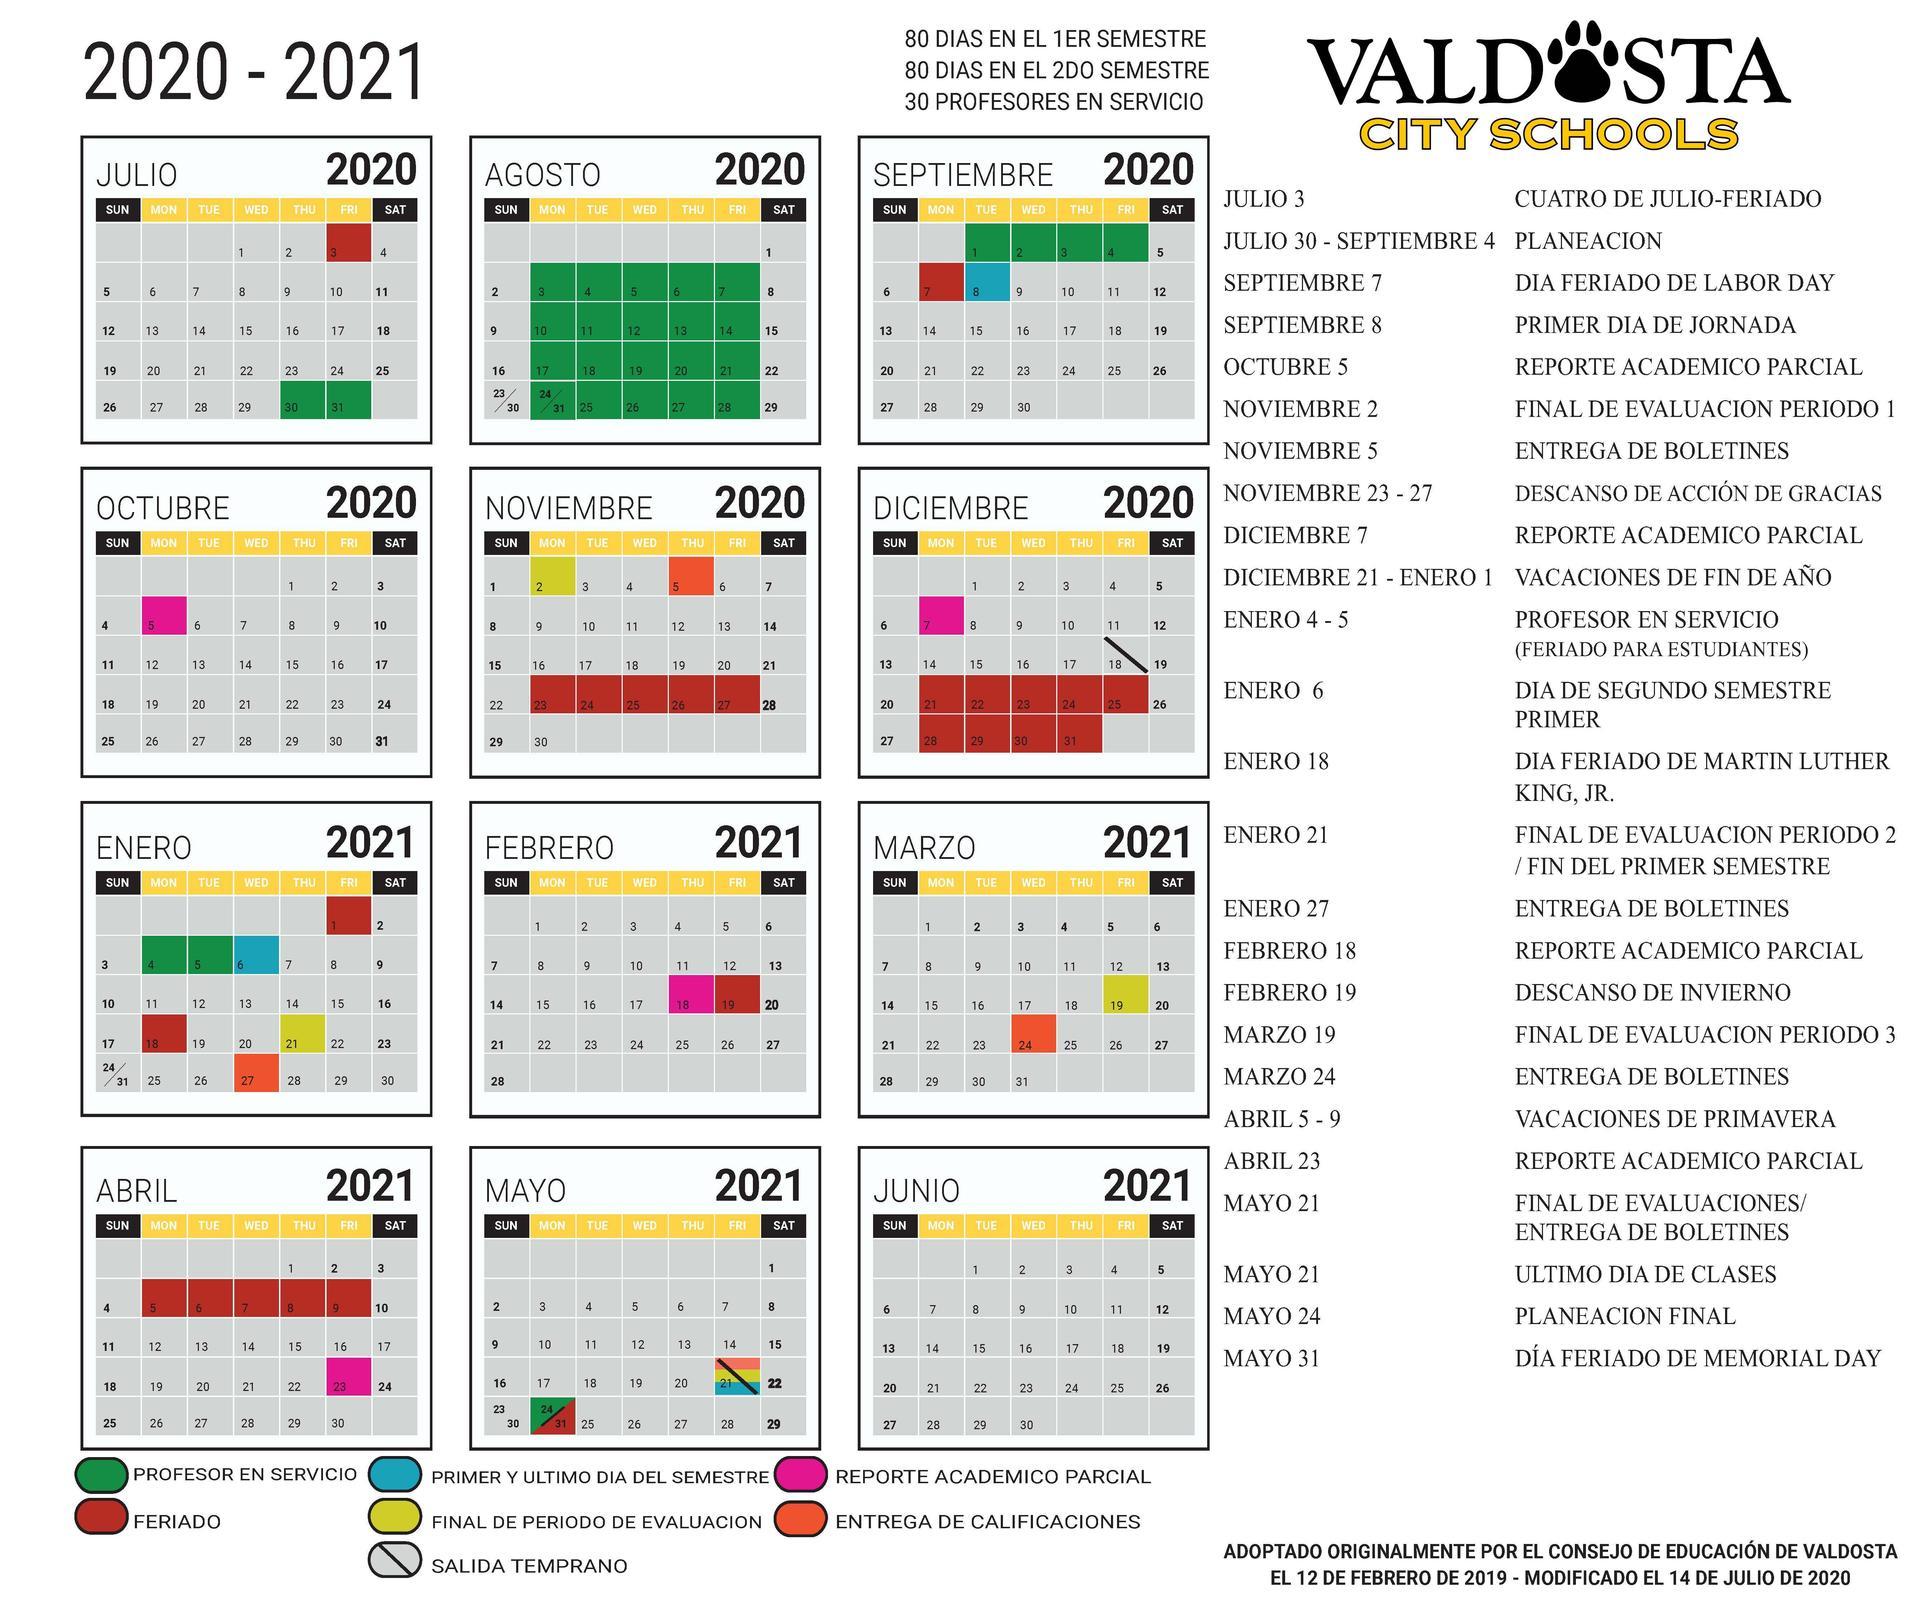 Uga Academic Calendar 2021 2022 throughout Academic Calendar For Delaware State